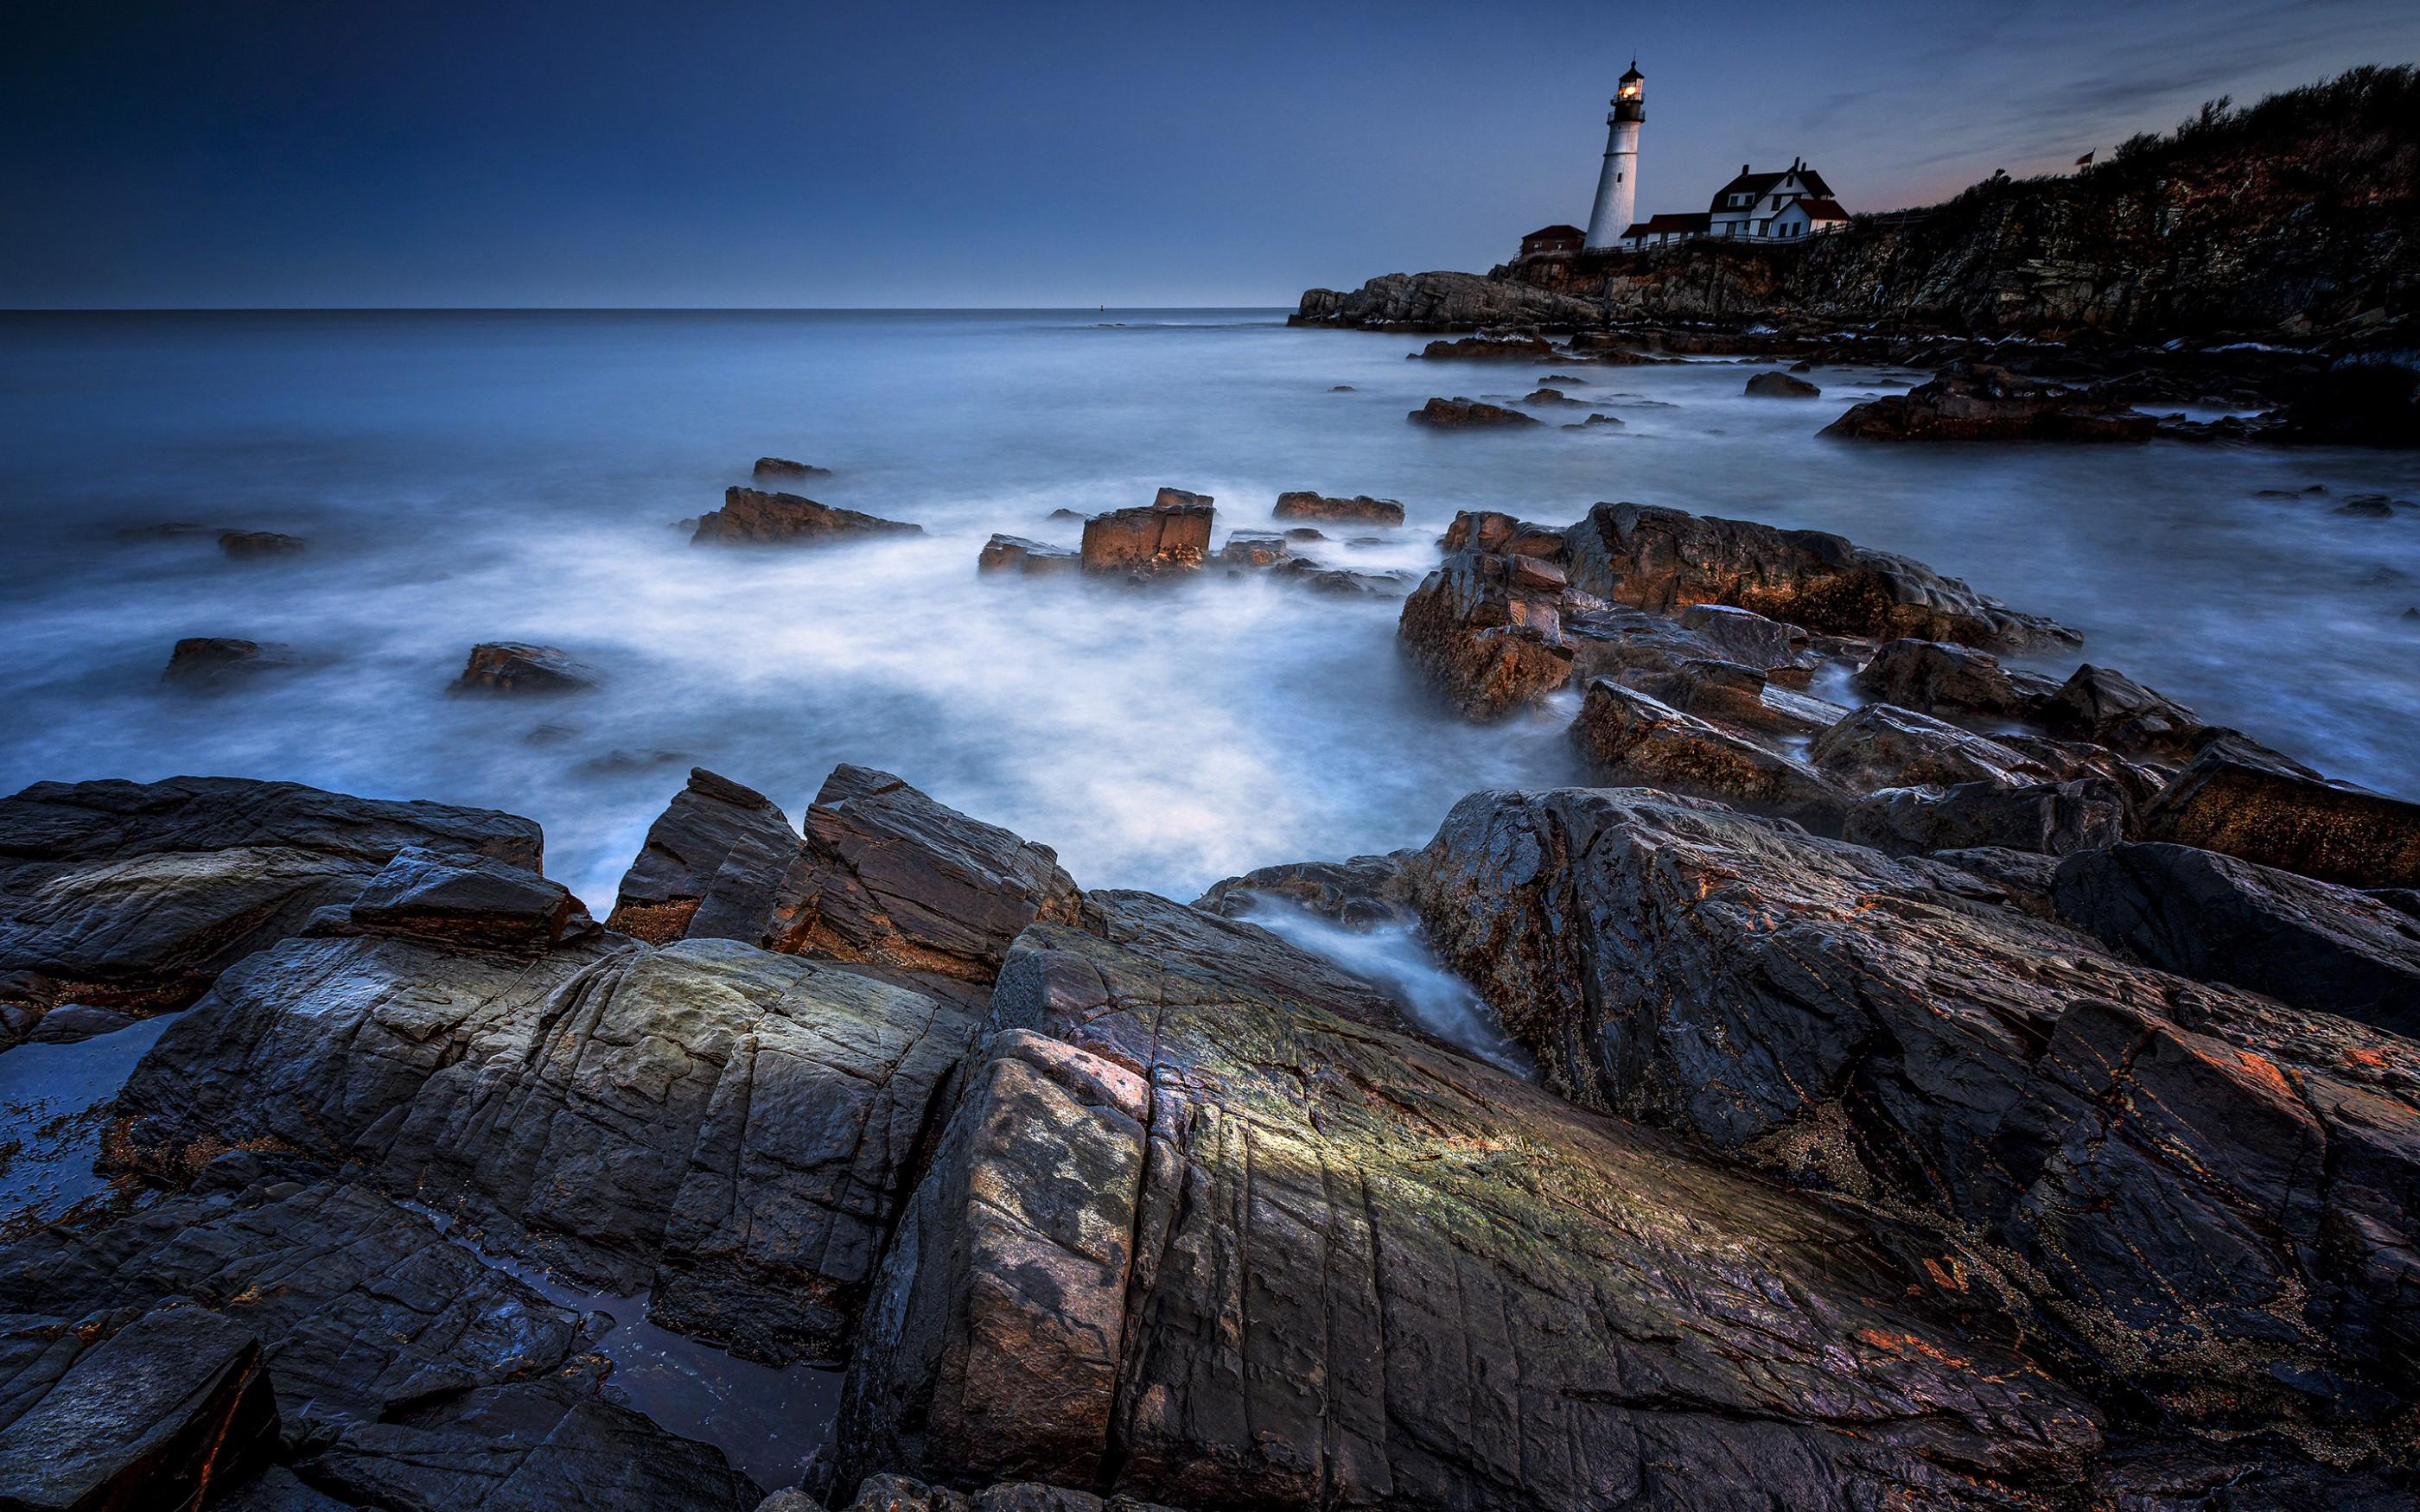 portland-head-lighthouse-sunset-maine-ash-newell